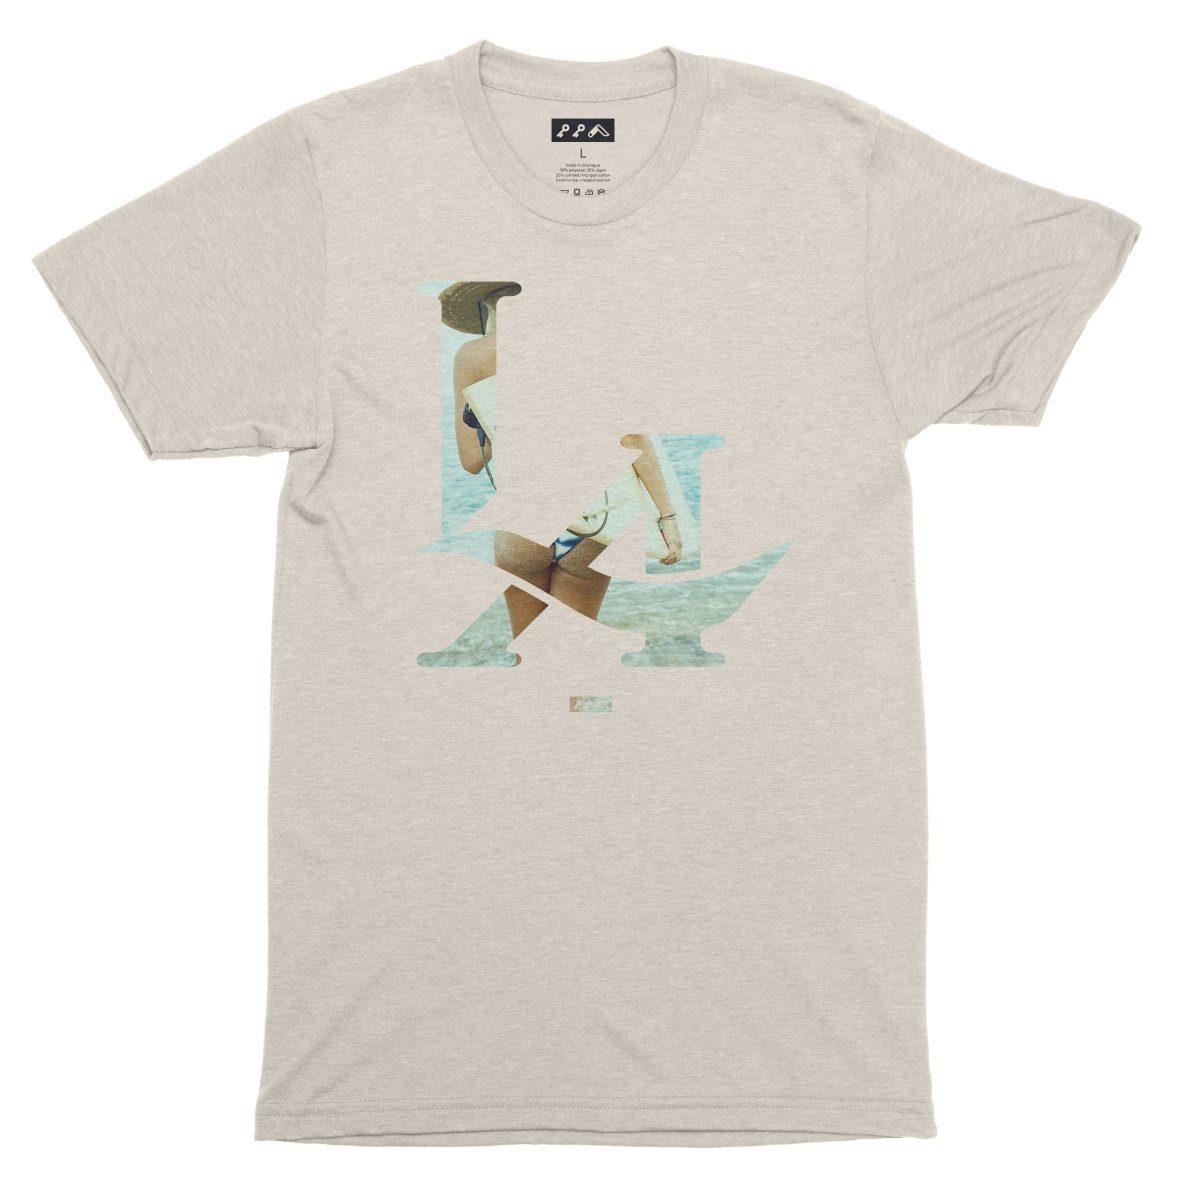 LA logo los angeles surfs up bikini beach butt t-shirt in oatmeal by kikicutt